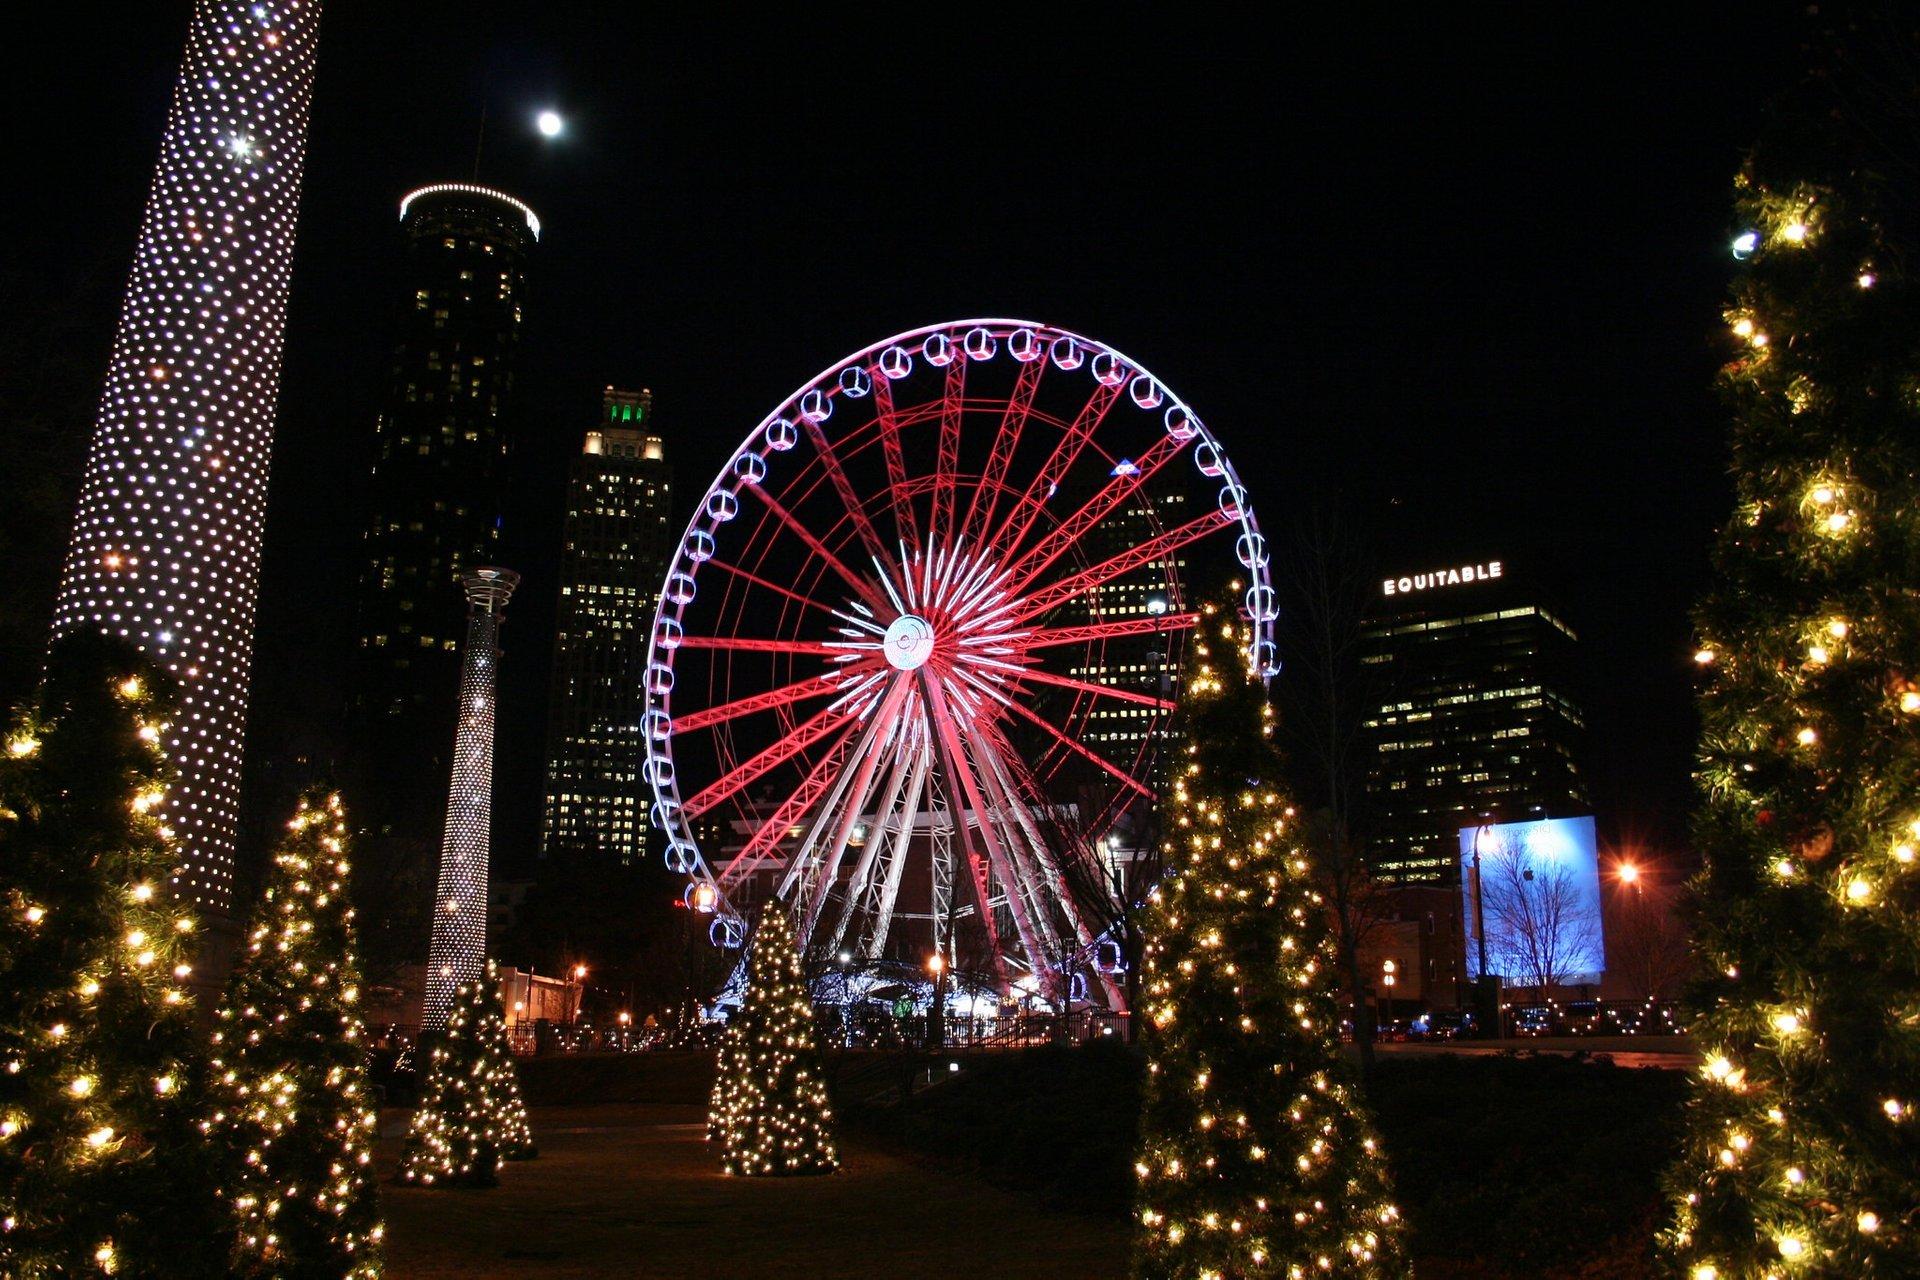 Christmas Lights Georgia 2020 Christmas Lights 2020 2021 in Georgia   Dates & Map